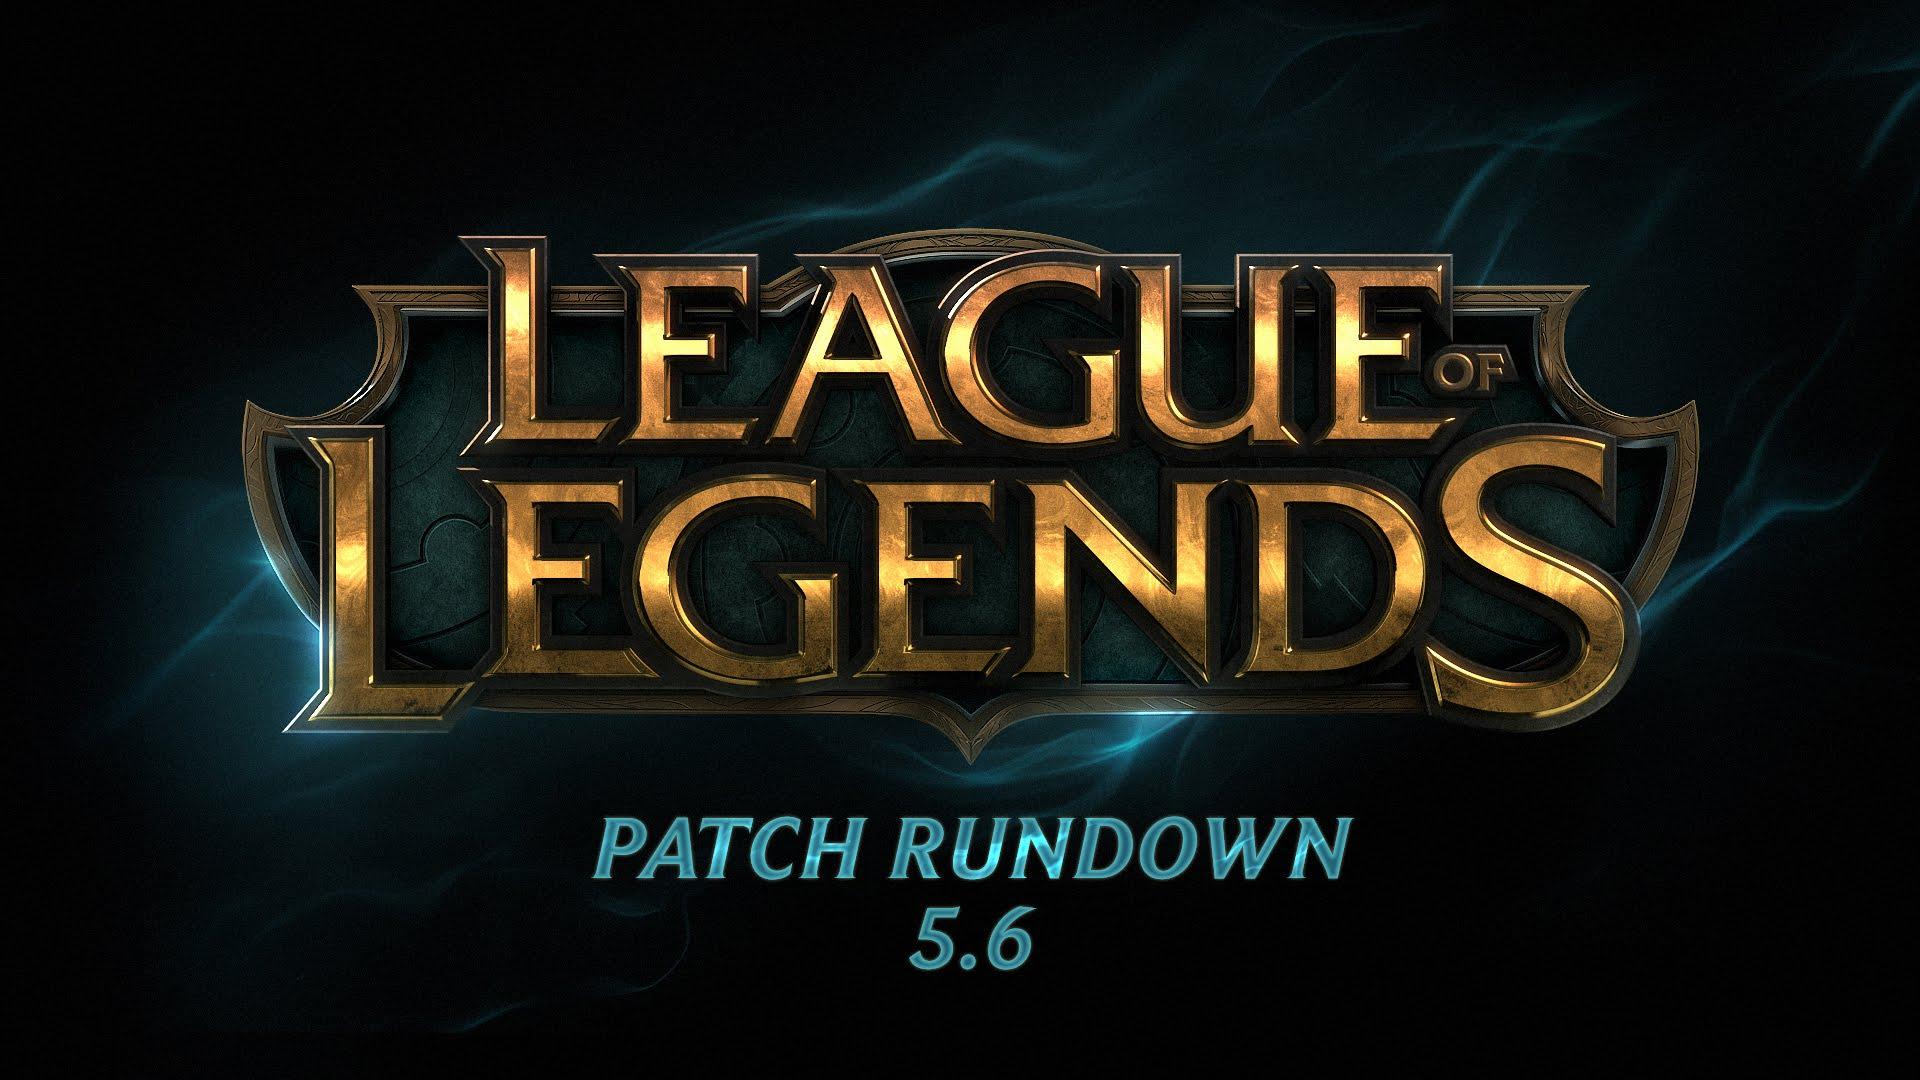 League of Legends Patch Rundown 5.6 Video Thumb